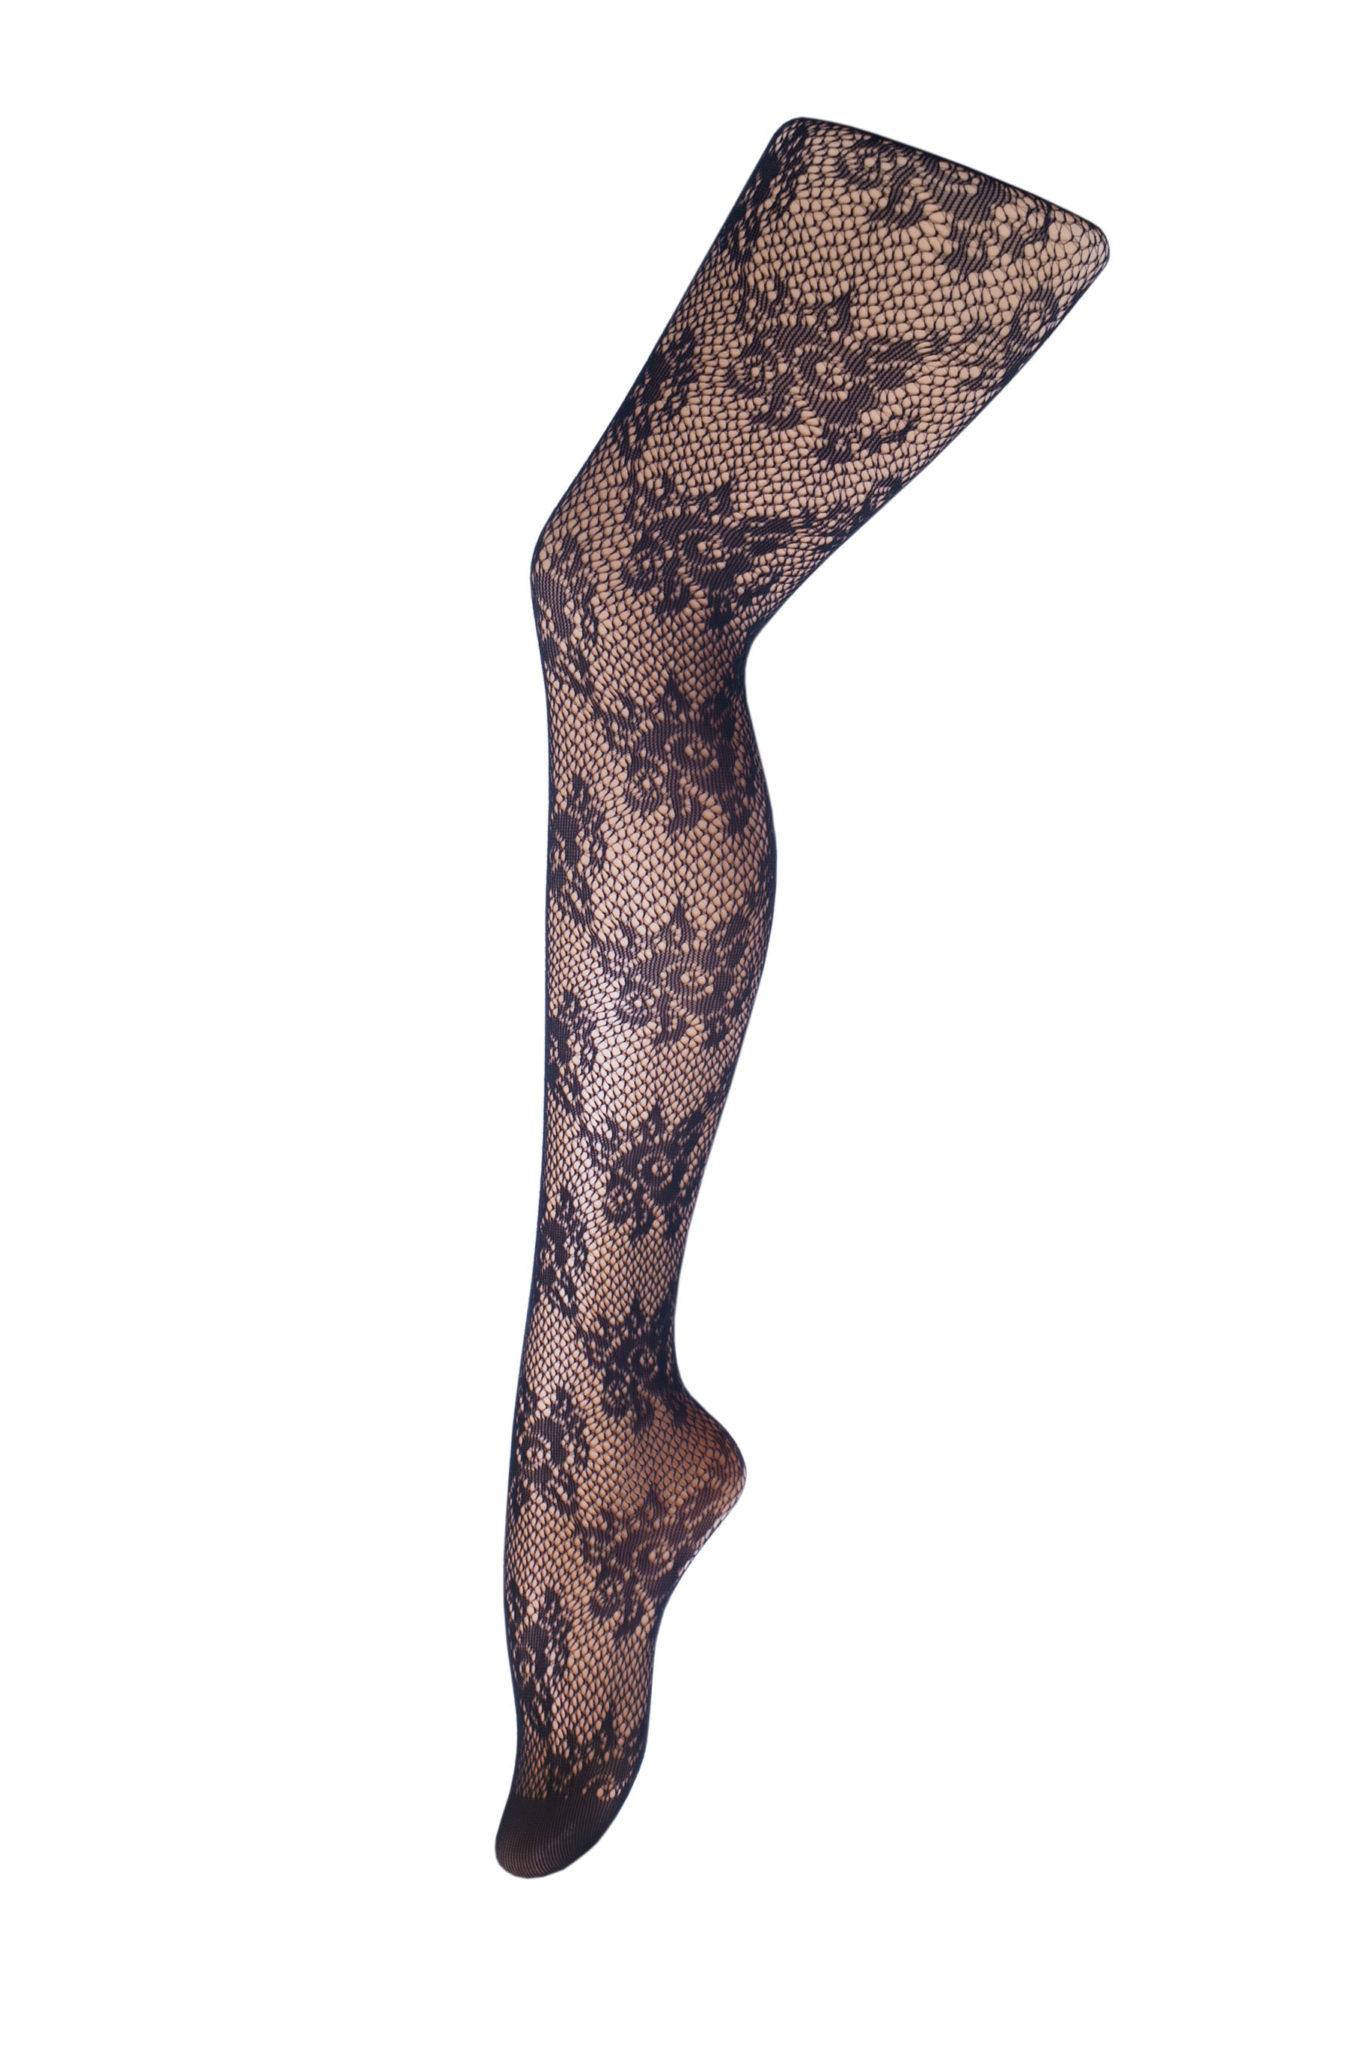 Wzorowe nogi – nowa kolekcja rajstop Gatta